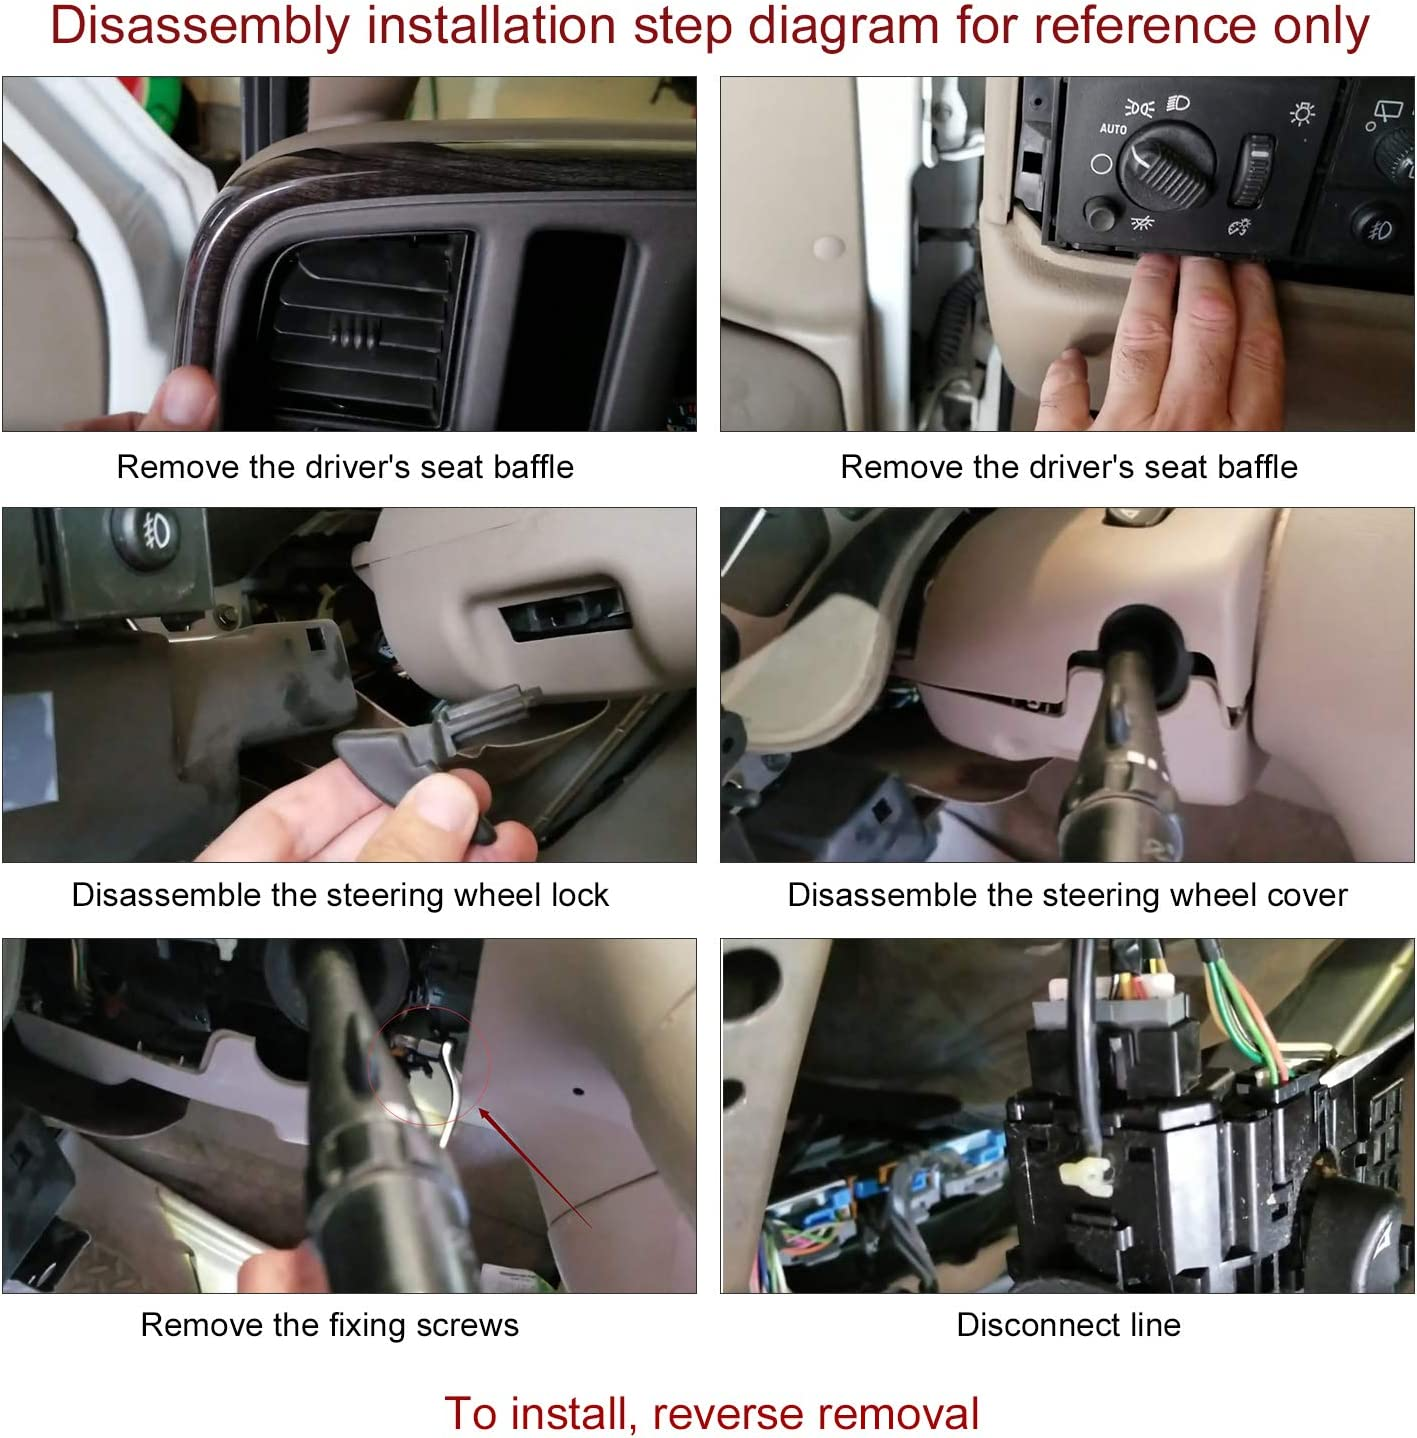 SPEEDWOW Turn Signal Wiper Windshield Dimmer Combination Headlight Lever Cruise Control Switch for Buick Rainier Cadillac Escalade Chevrolet GMC Hummer Isuzu Oldsmobile 12450067